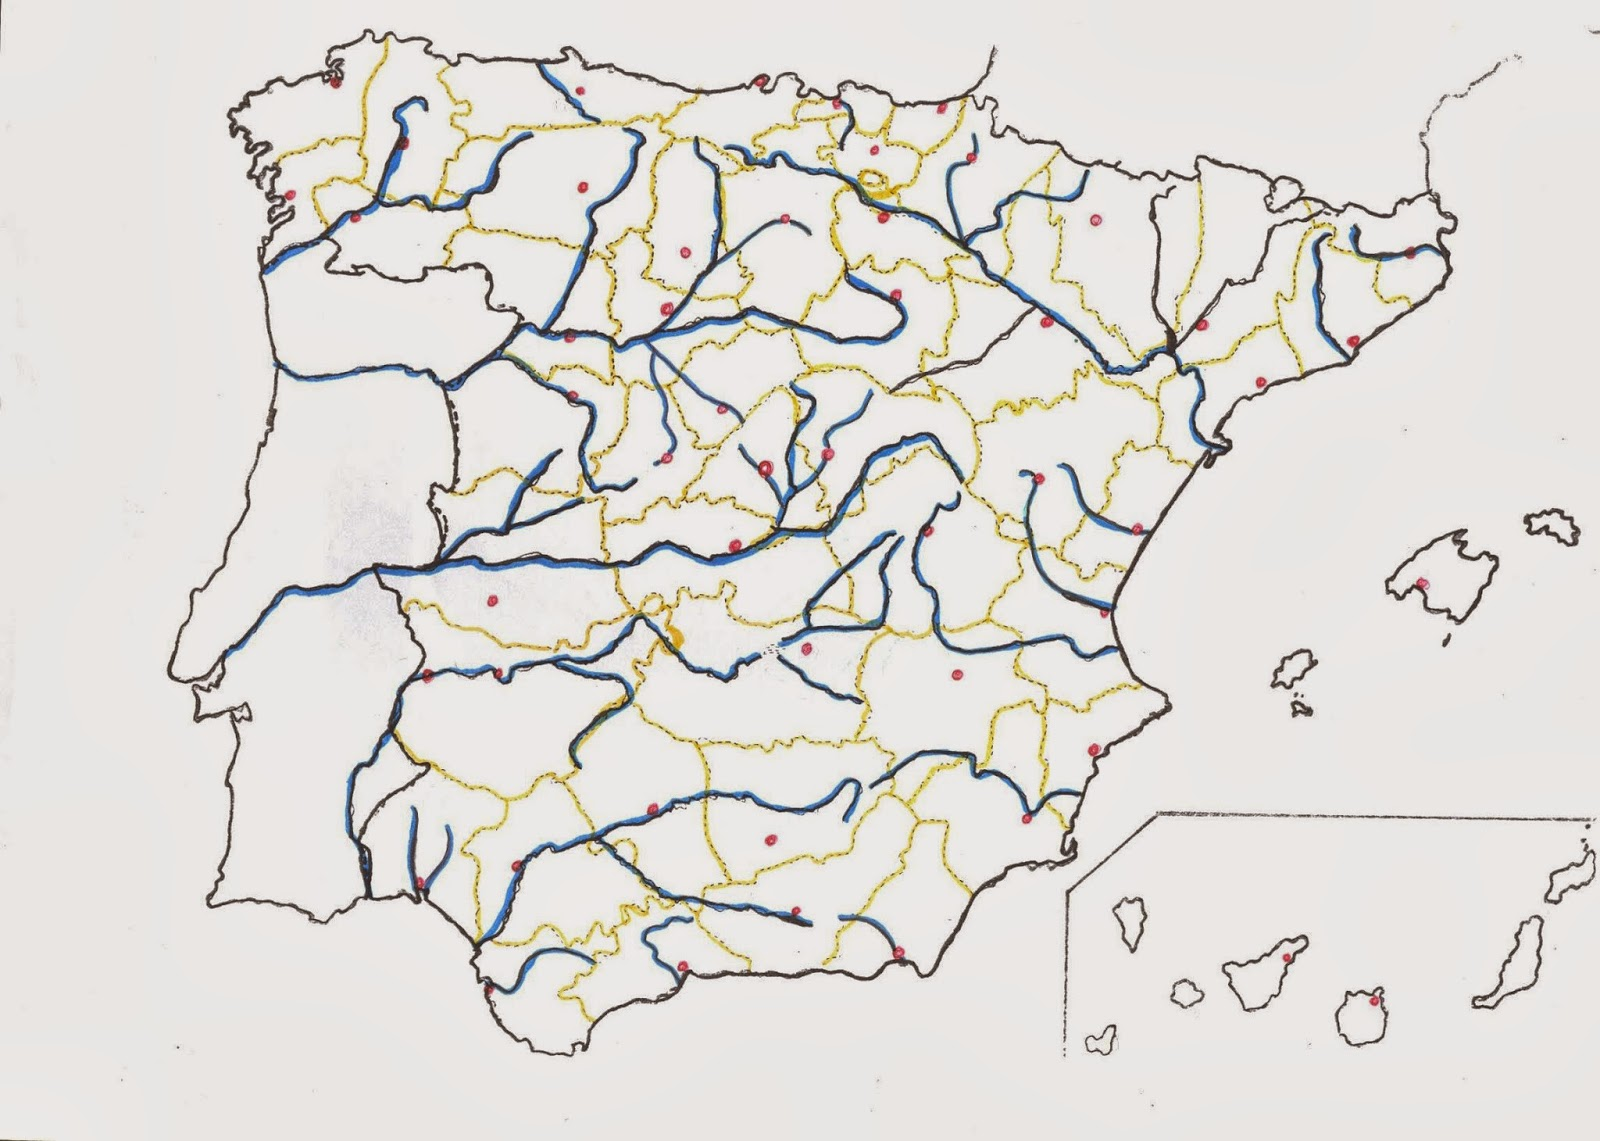 Mapa Mudo Espaa Rios Imprimir